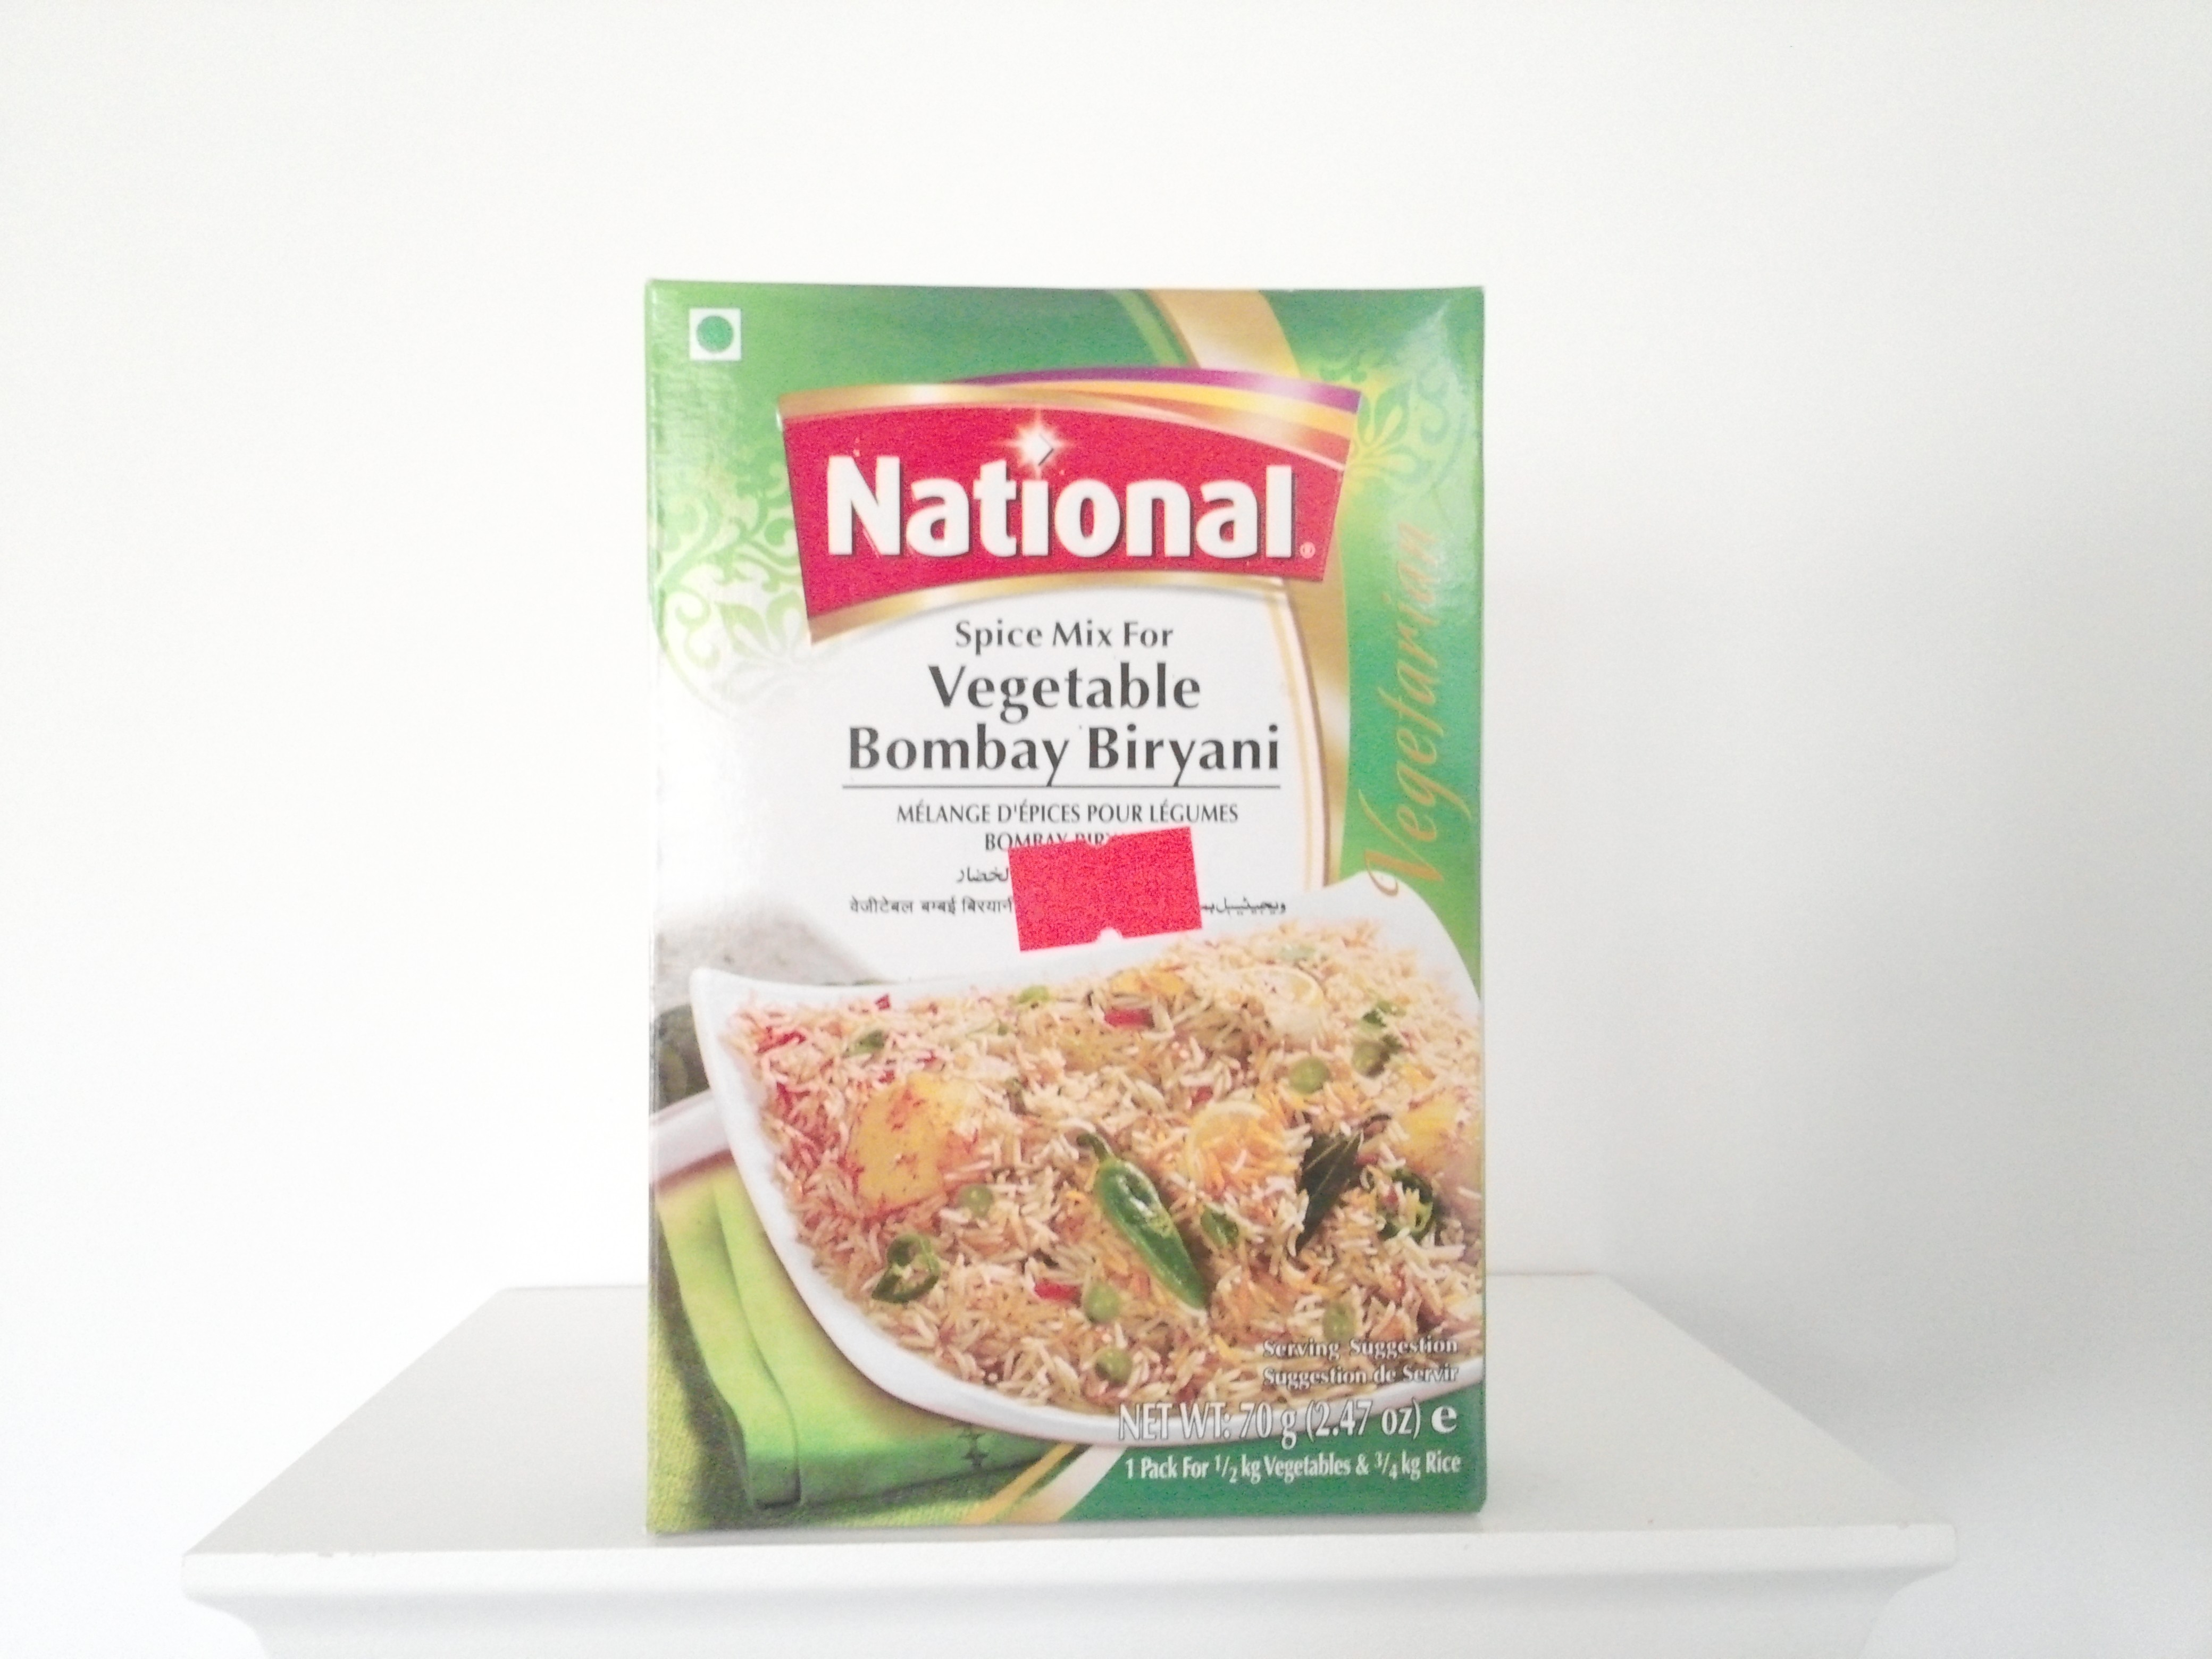 National Vegetable Bombay Biryani Spice Mix 70 grm